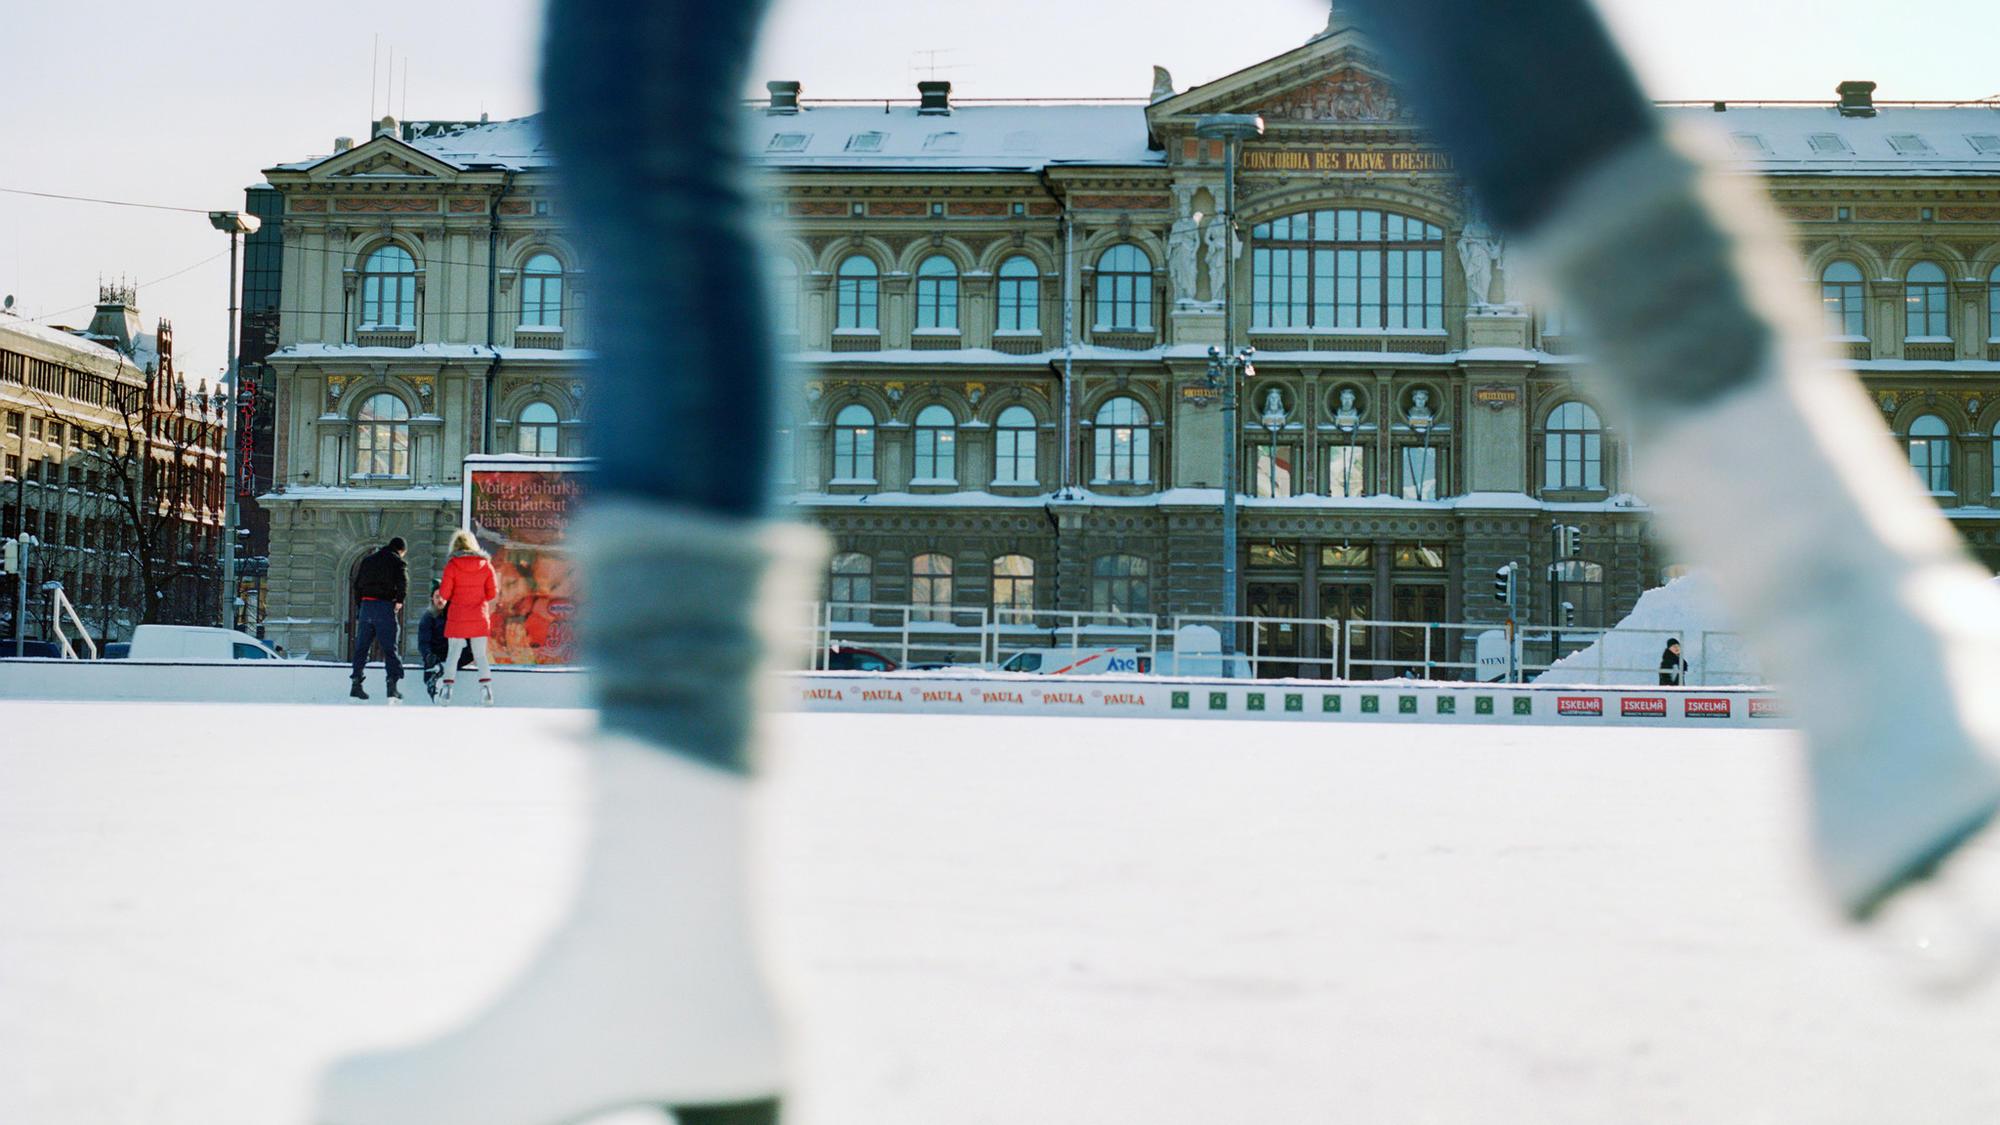 Ateneum Art Museum, Finnish National Gallery, Helsinki, Finland